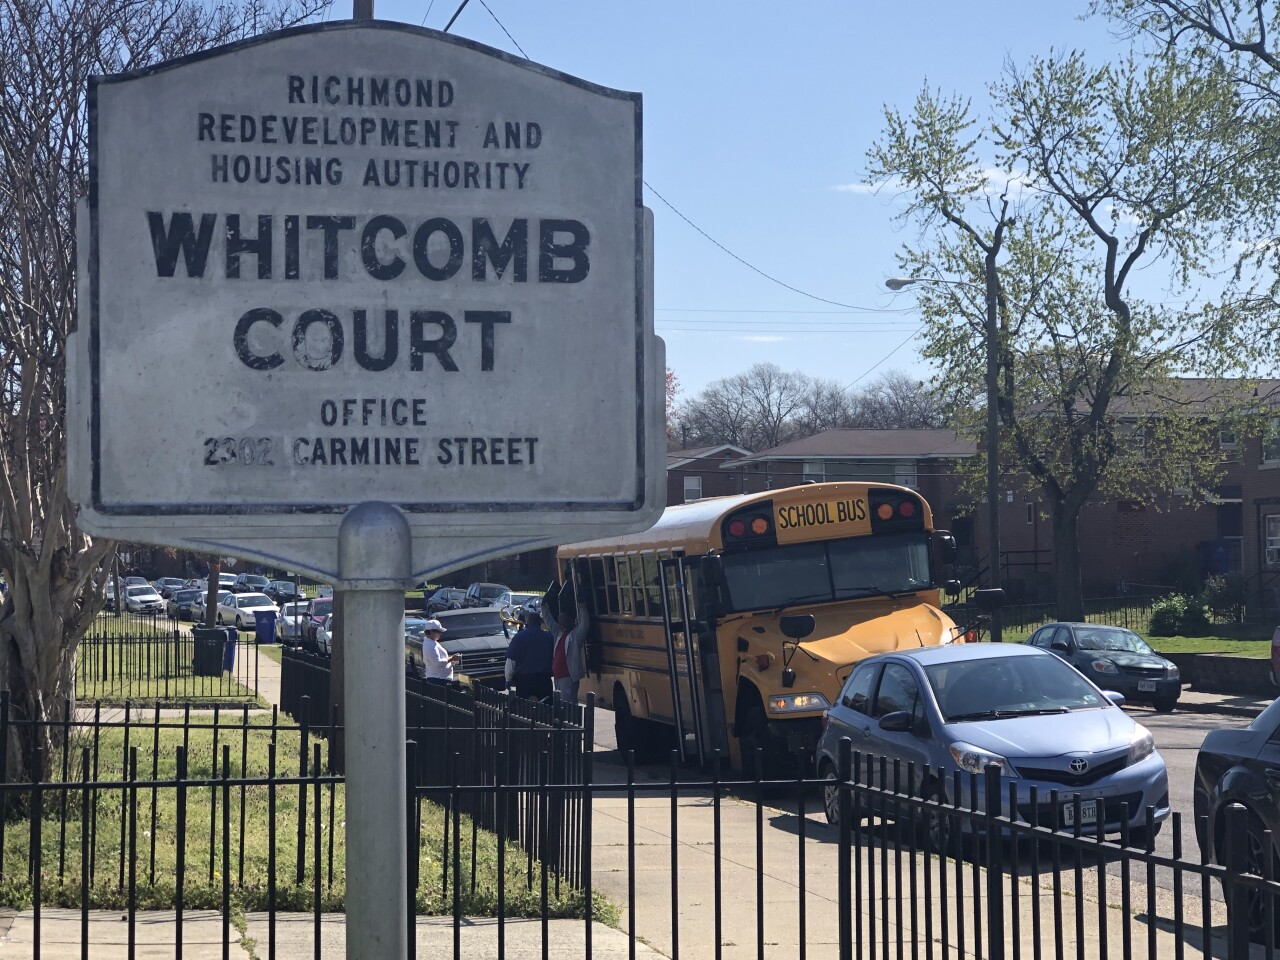 Whitcomb Court